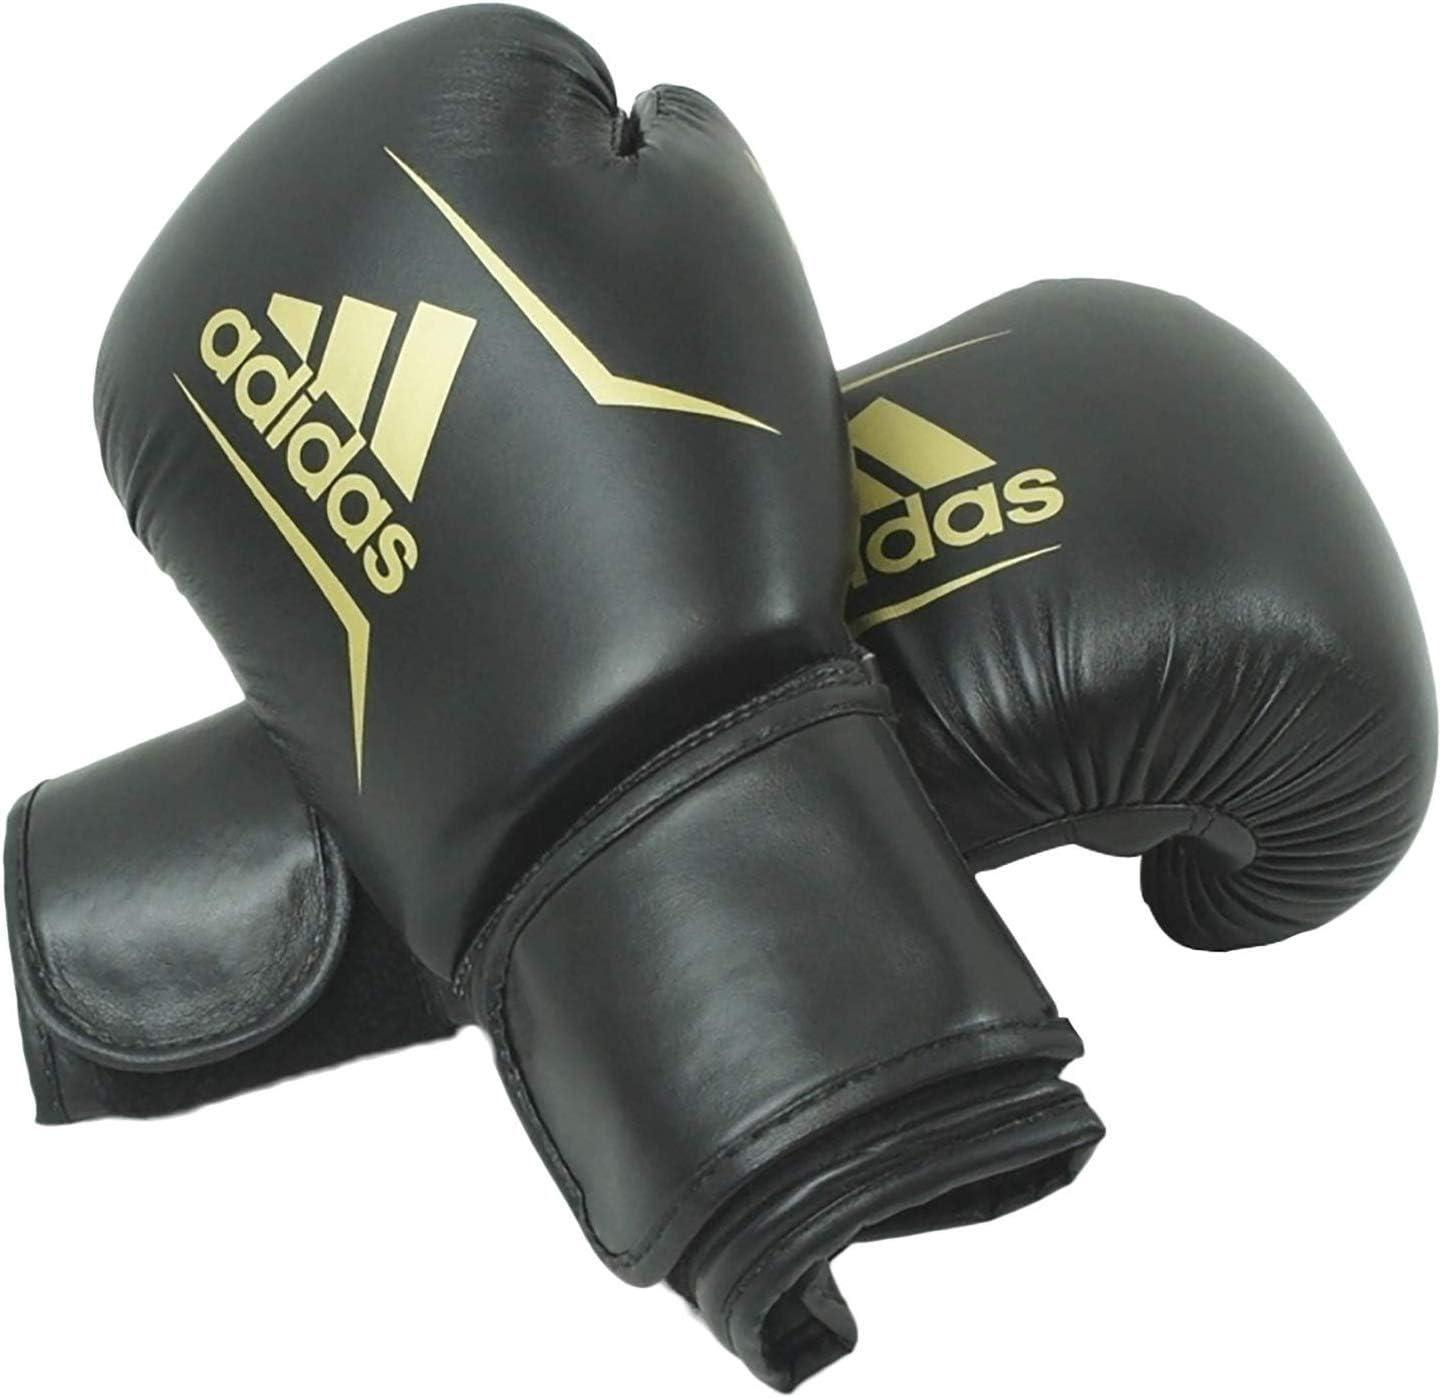 adidas Boxhandschuhe Speed 50 Guantes de Boxeo, Unisex